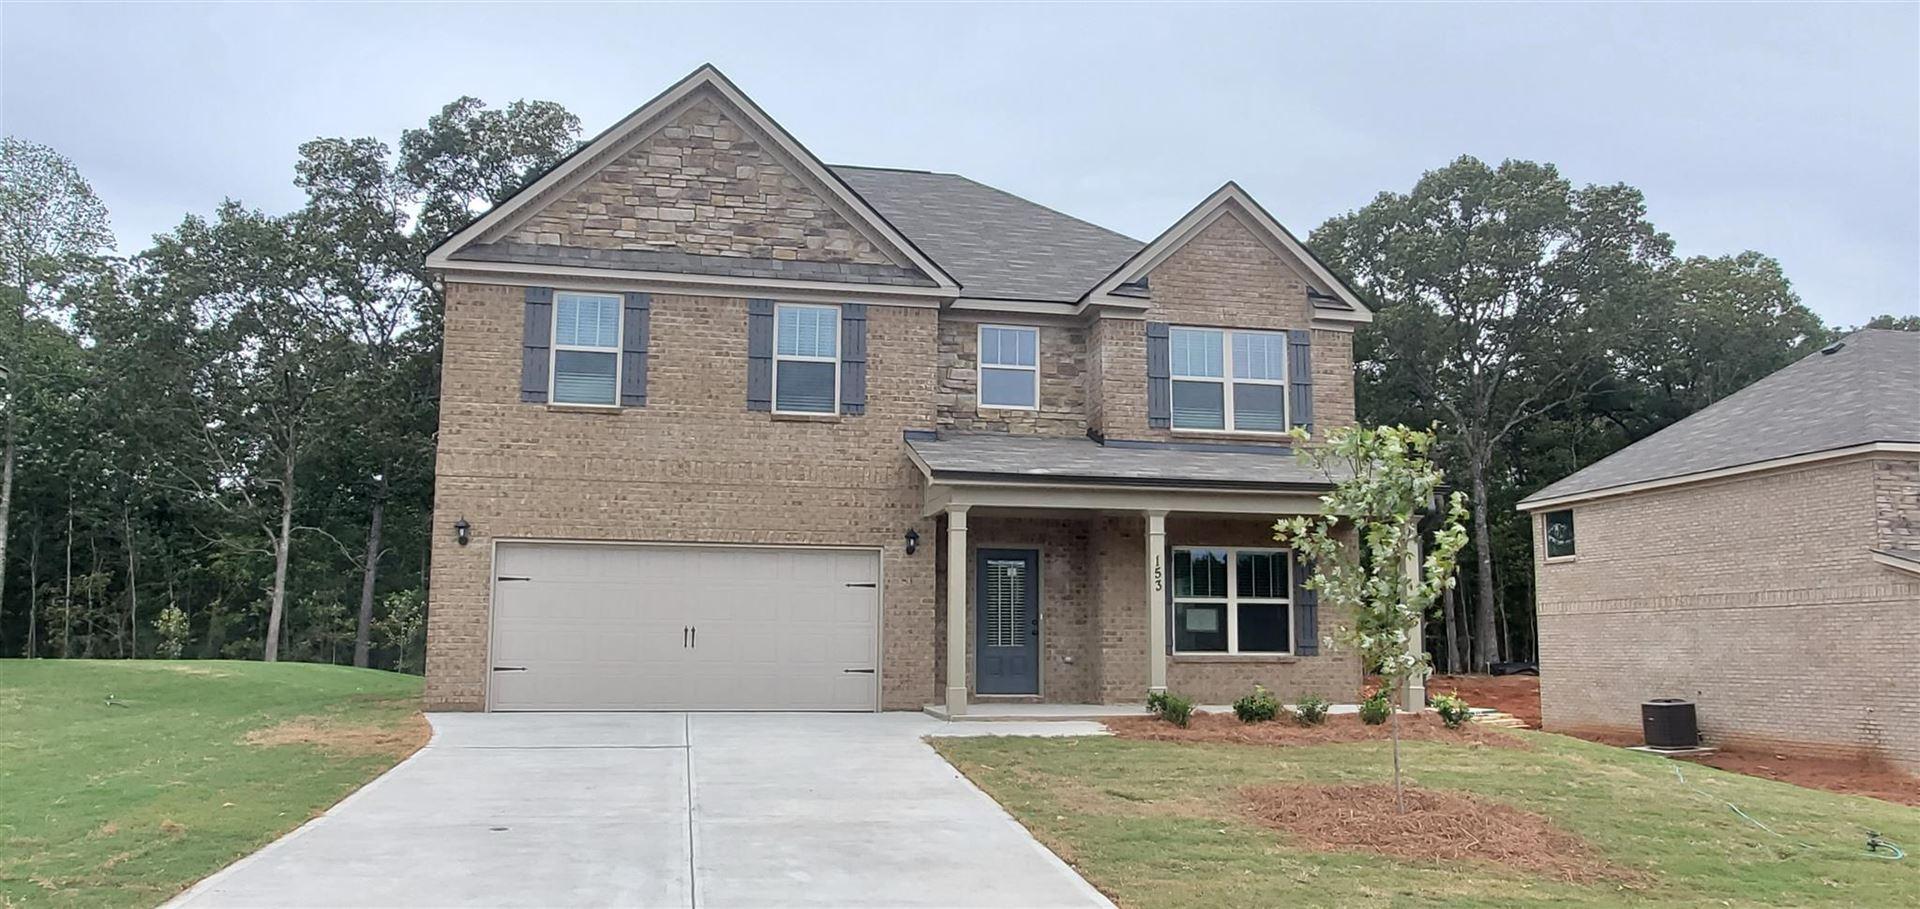 Photo of 153 Amelia Way Lot 8, Ellenwood, GA 30294 (MLS # 8862166)